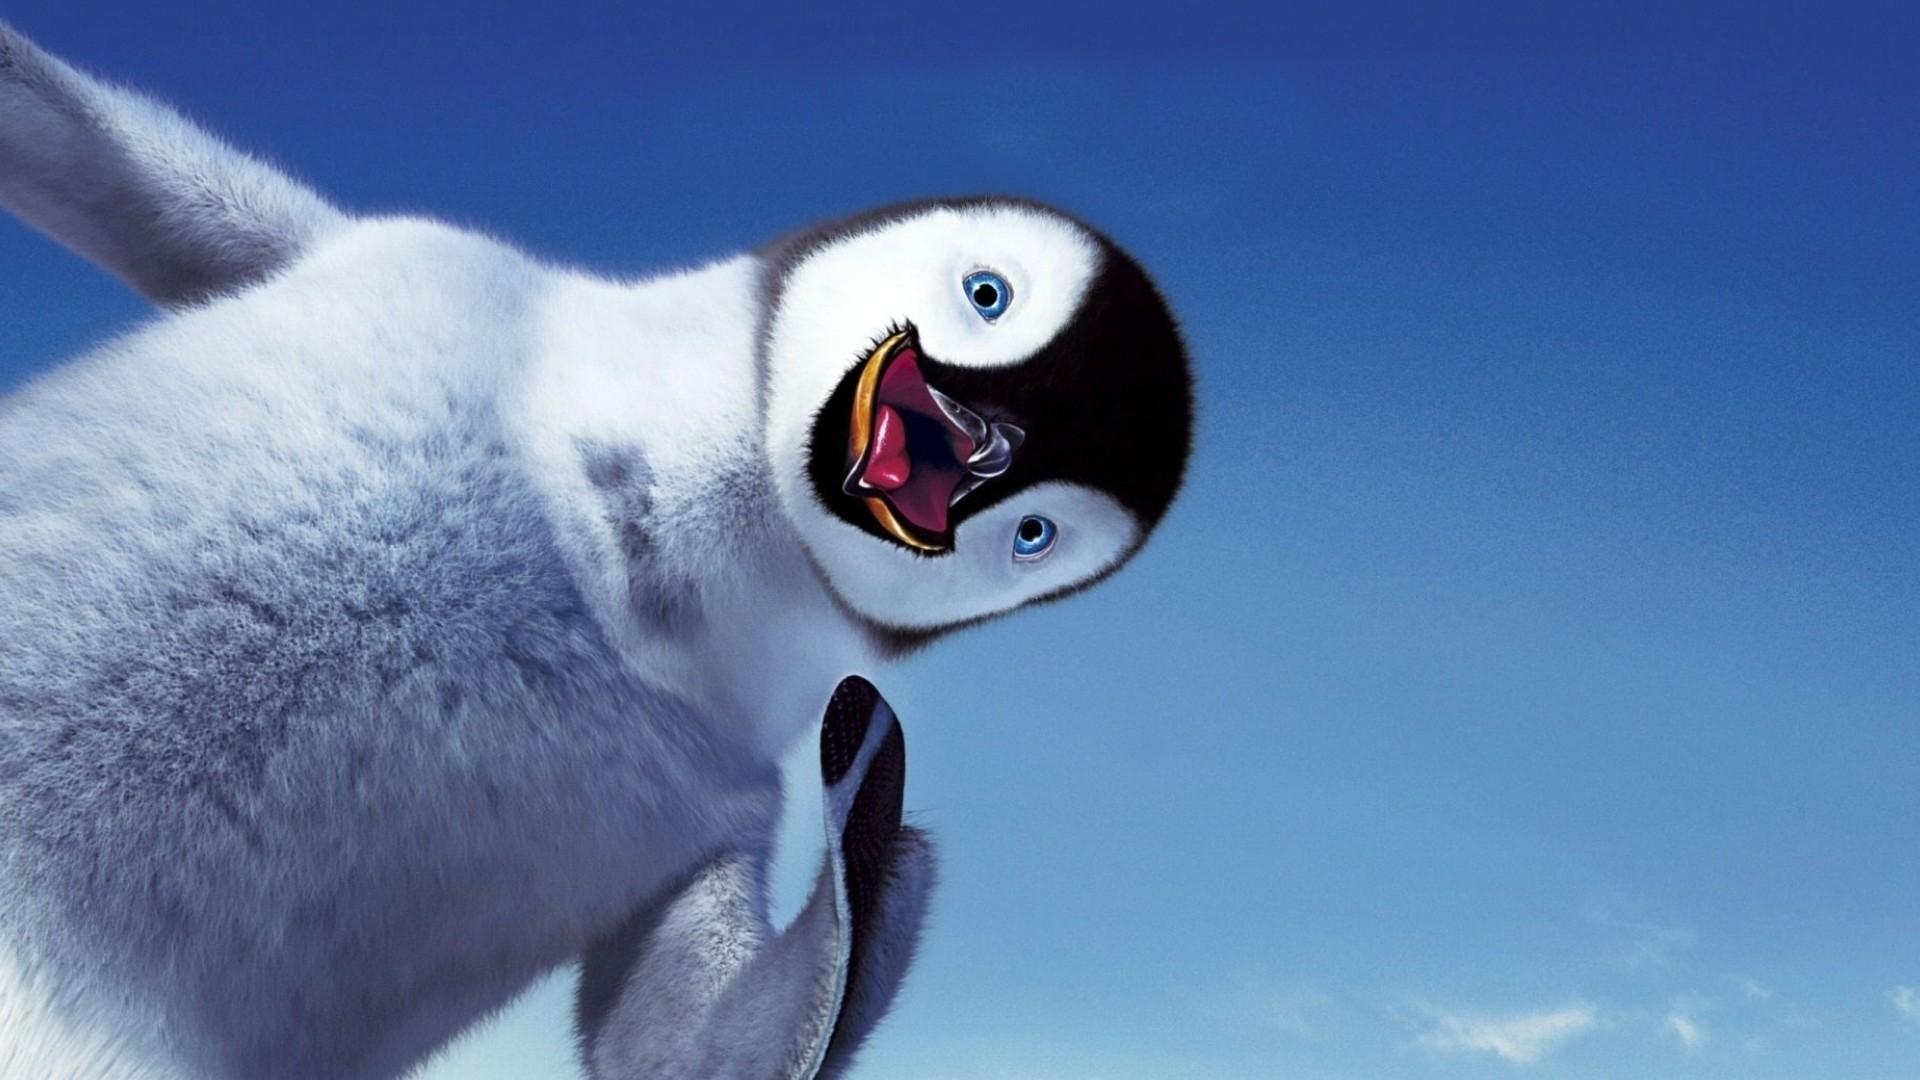 Baby penguin Wallpapers, Baby penguin Backgrounds, Baby penguin Free .